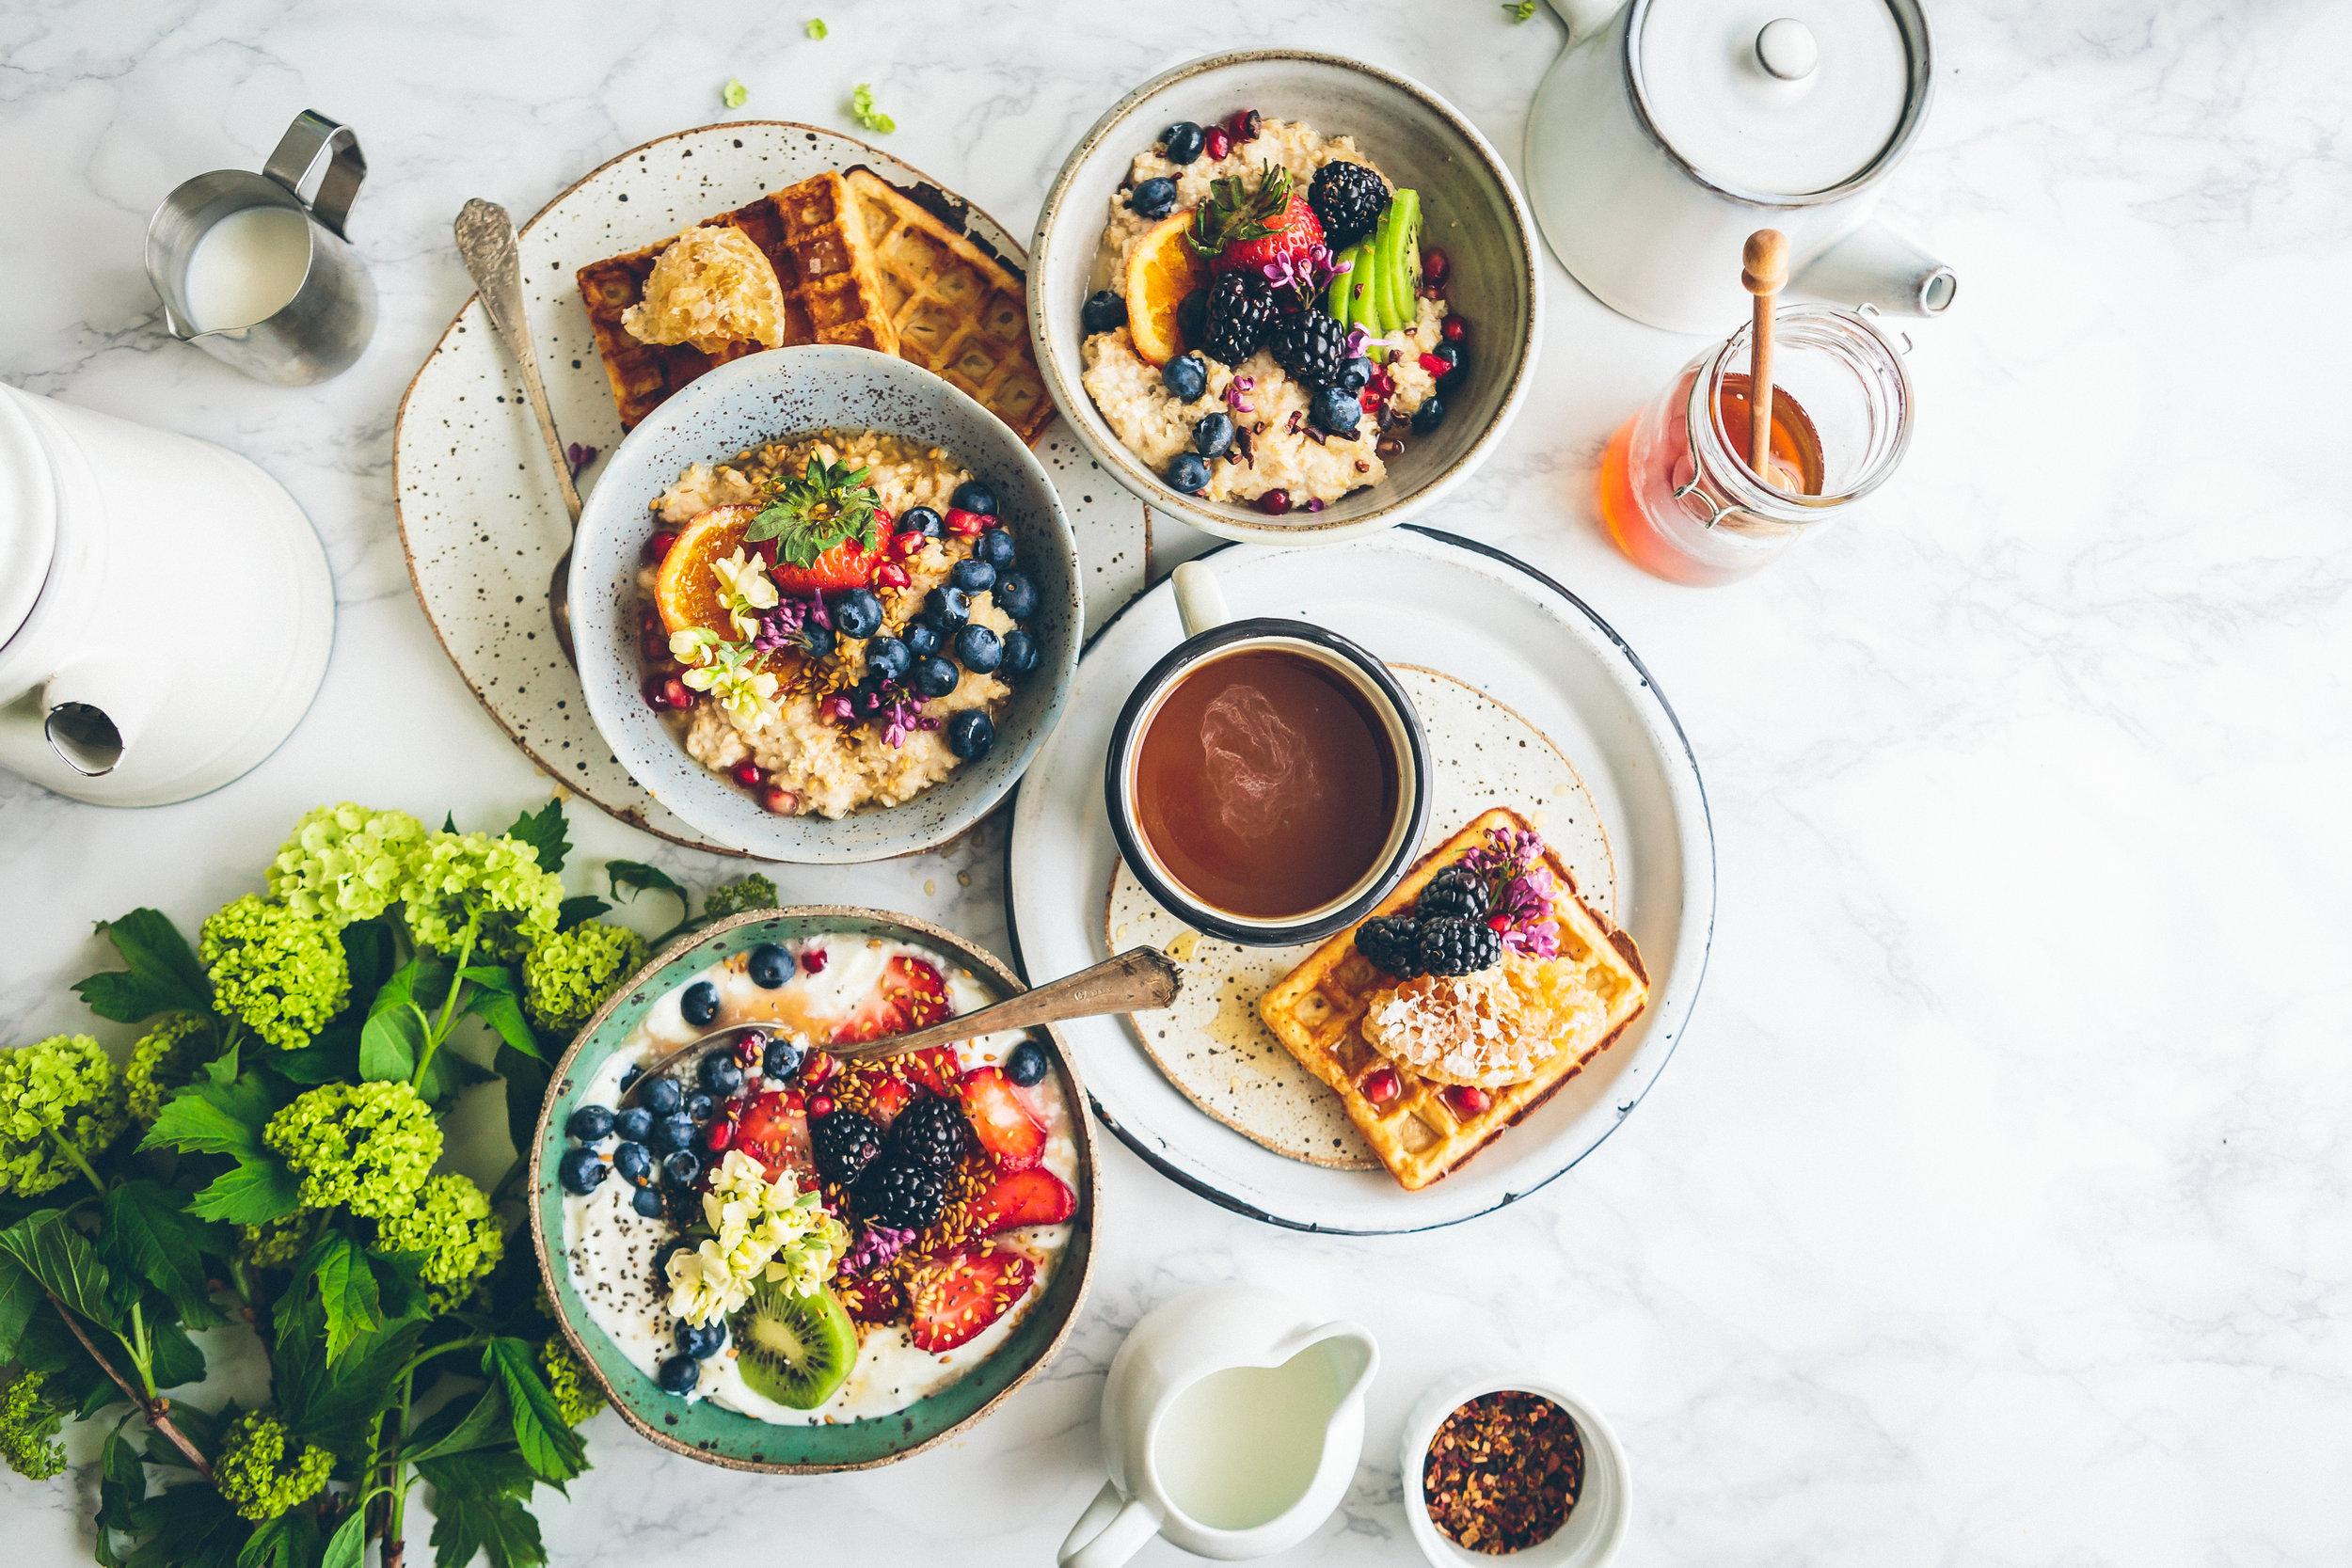 Breakfast setting - Unsplash - brooke-lark-250695.jpg